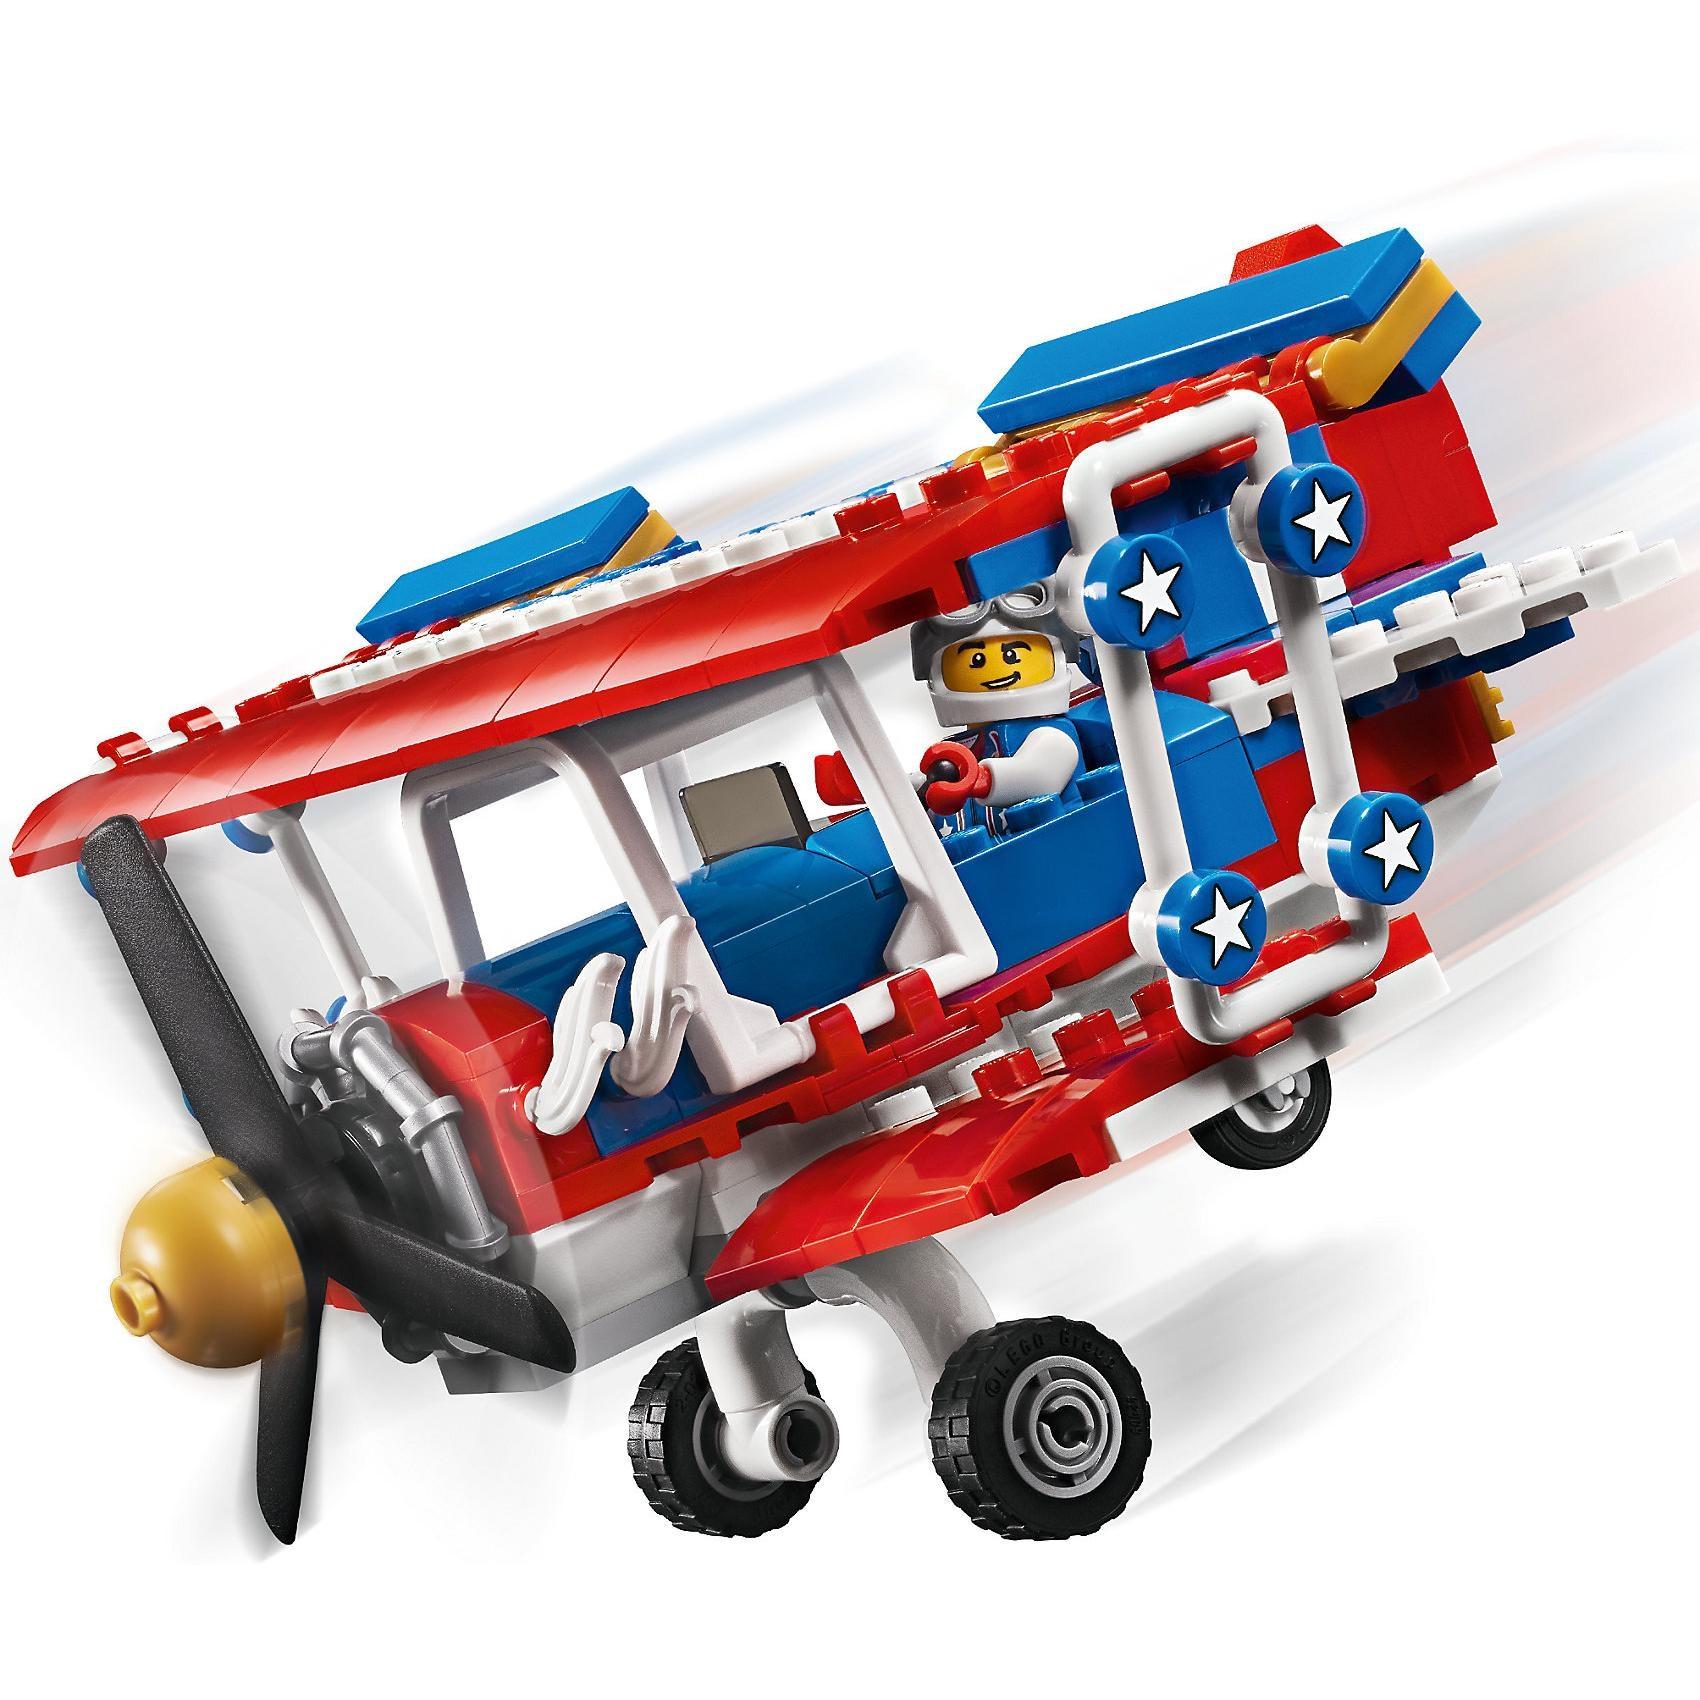 Lego Creator 31076 Tollkühner Flieger